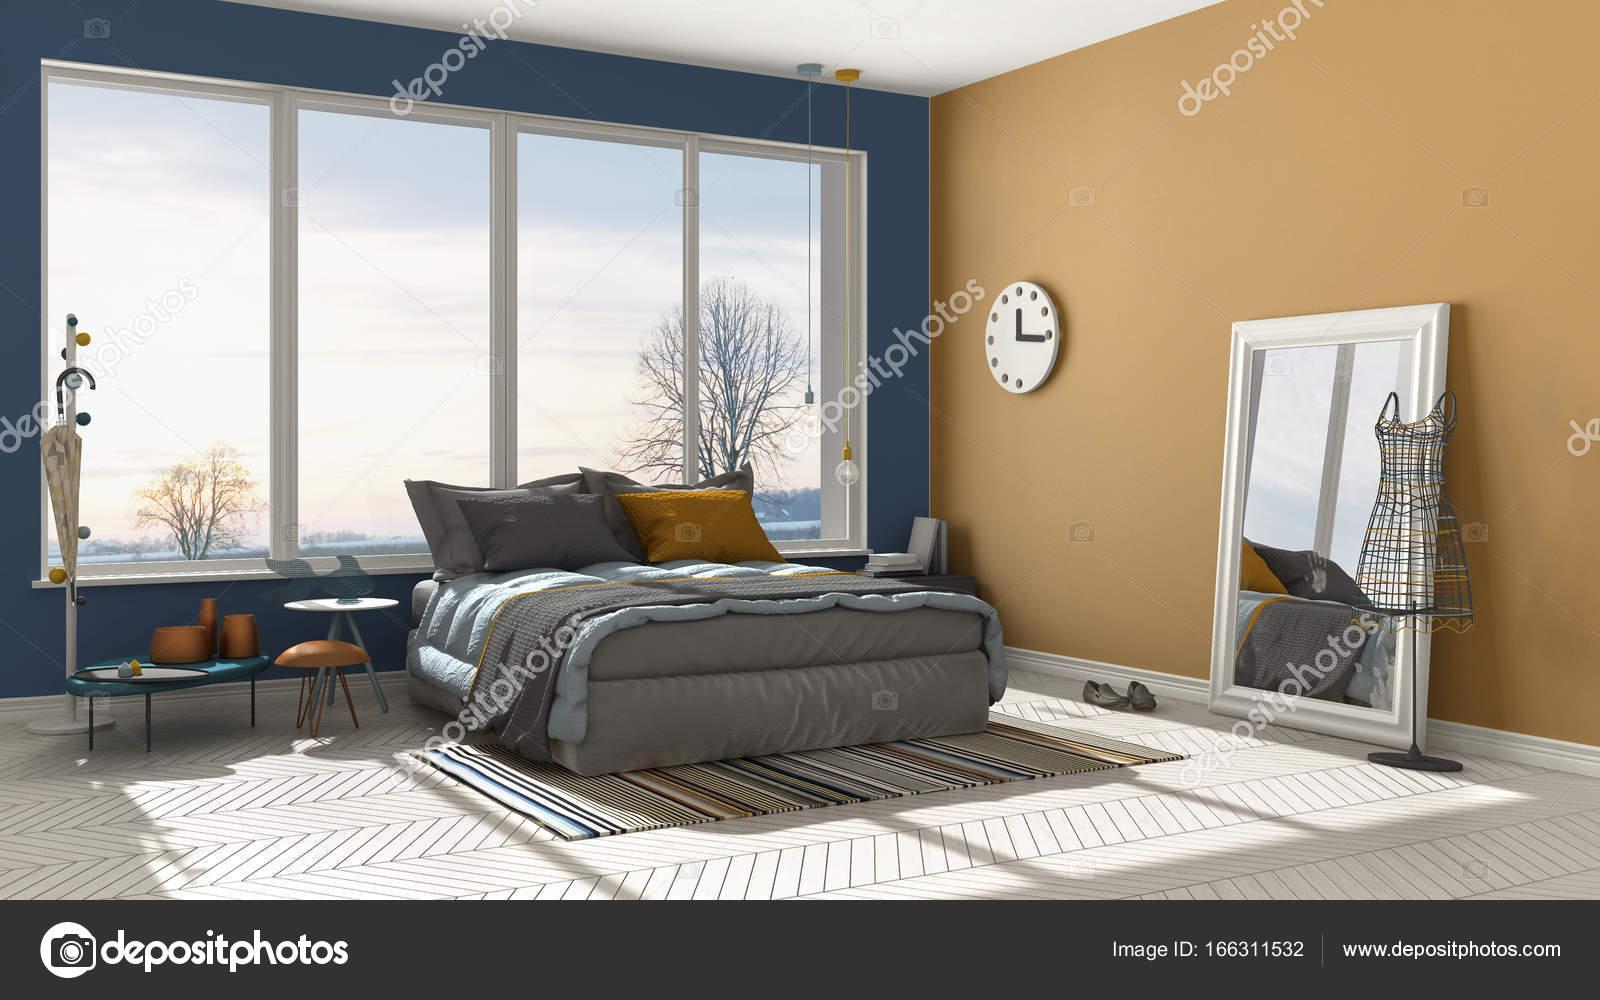 Colored Modern Blue And Orange Bedroom With Big Panoramic Window Sunset Sunrise Architecture Minimalist Interior Design Photo By ArchiVIz